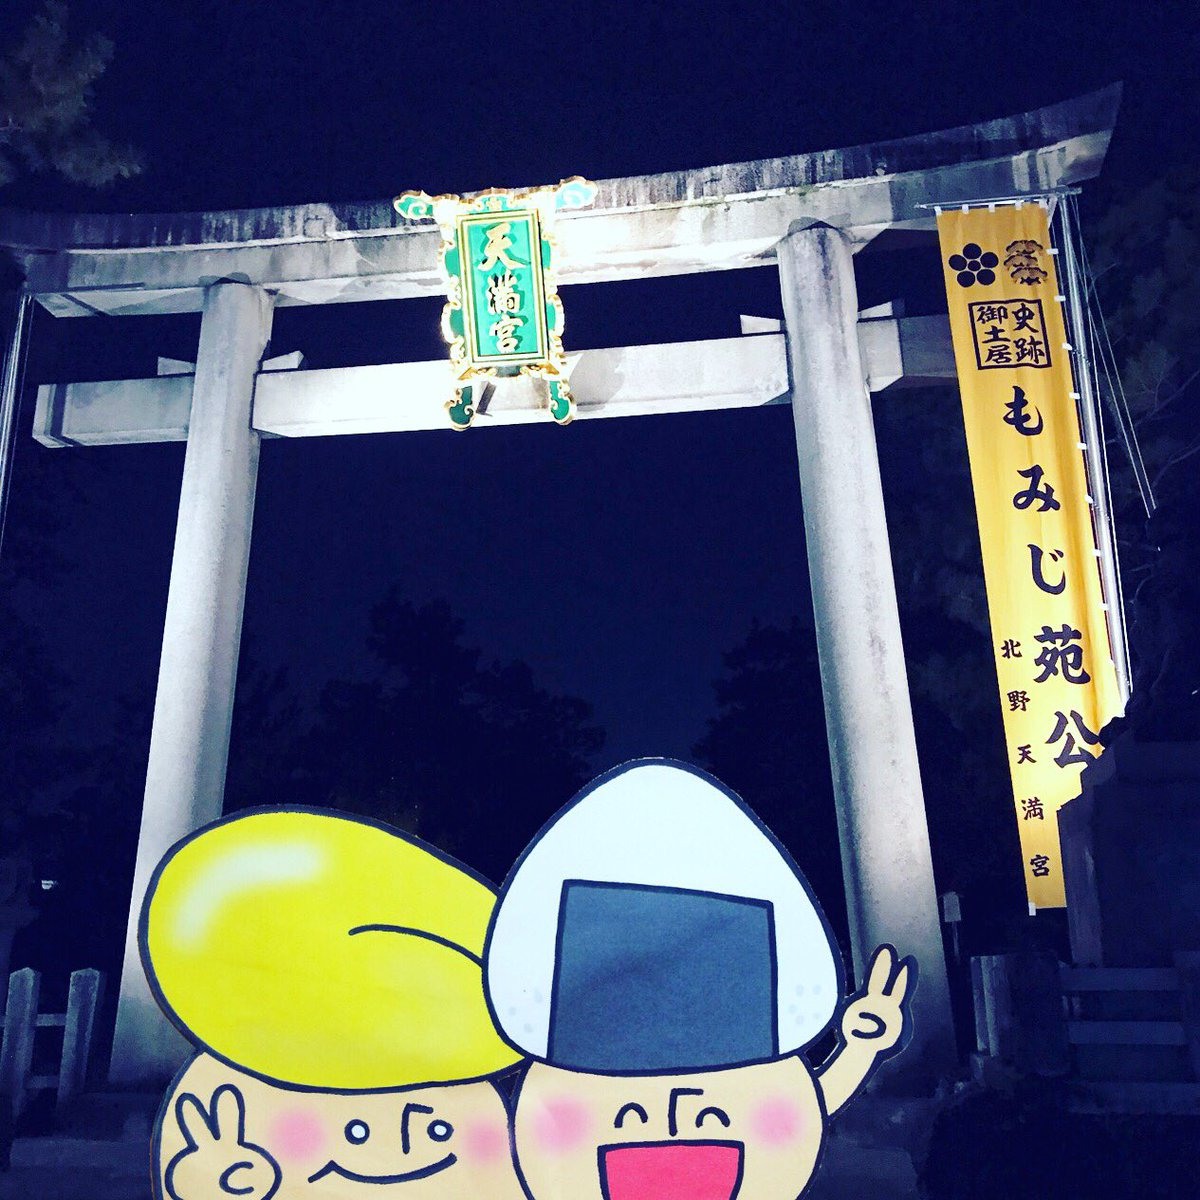 test ツイッターメディア - おむすびきのこさんは京都が大好き。 お散歩途中に学問の神様、北野天満宮にやってきたよ!  Omusubi mushroom loves Kyoto❤️   #japan #kyoto #kyototrip #kyotojapan #日本 #京都 #京都観光 #おむすびきのこさん #yasijun #illustration #イラスト #旅 #散歩 #オススメの京都 #character https://t.co/qGgc3joNmD